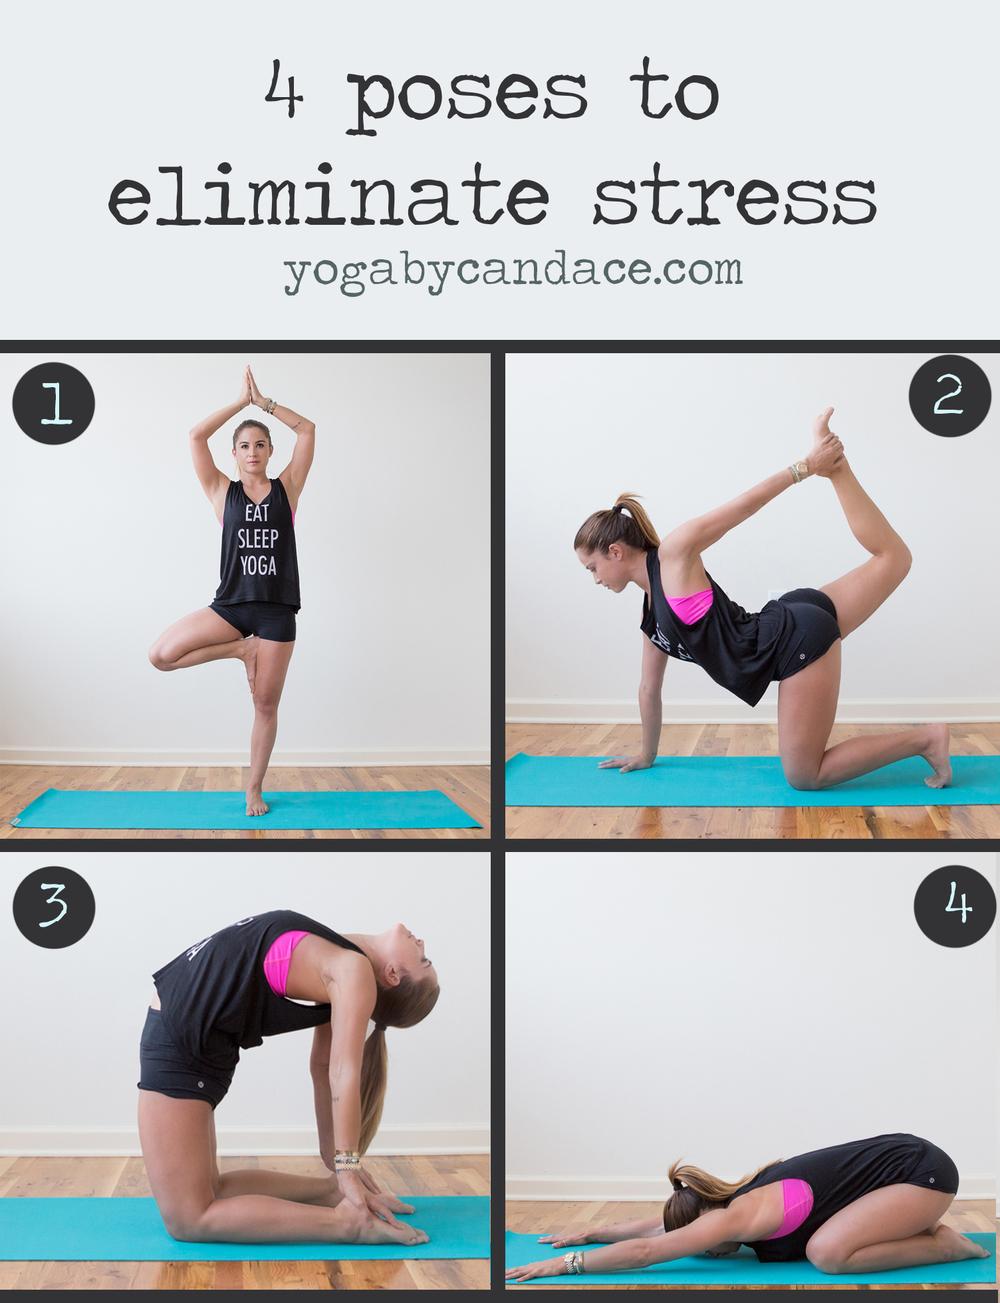 Pin now, practice later!  Wearing:  Sociable Apparel tank  c/o,  lululemon shorts . Using  Jade yoga mat .